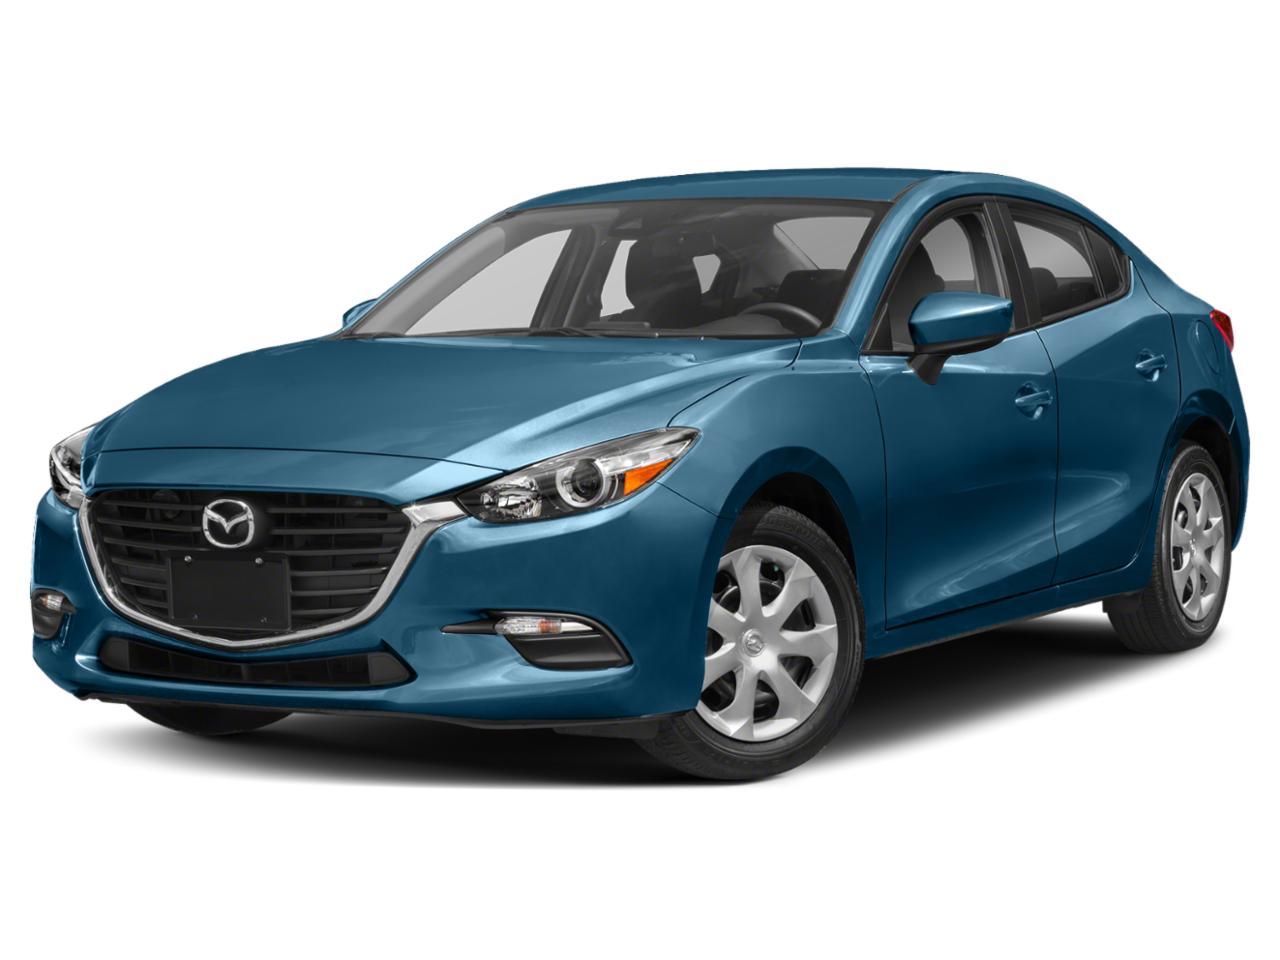 2018 Mazda Mazda3 4-Door Vehicle Photo in San Leandro, CA 94577